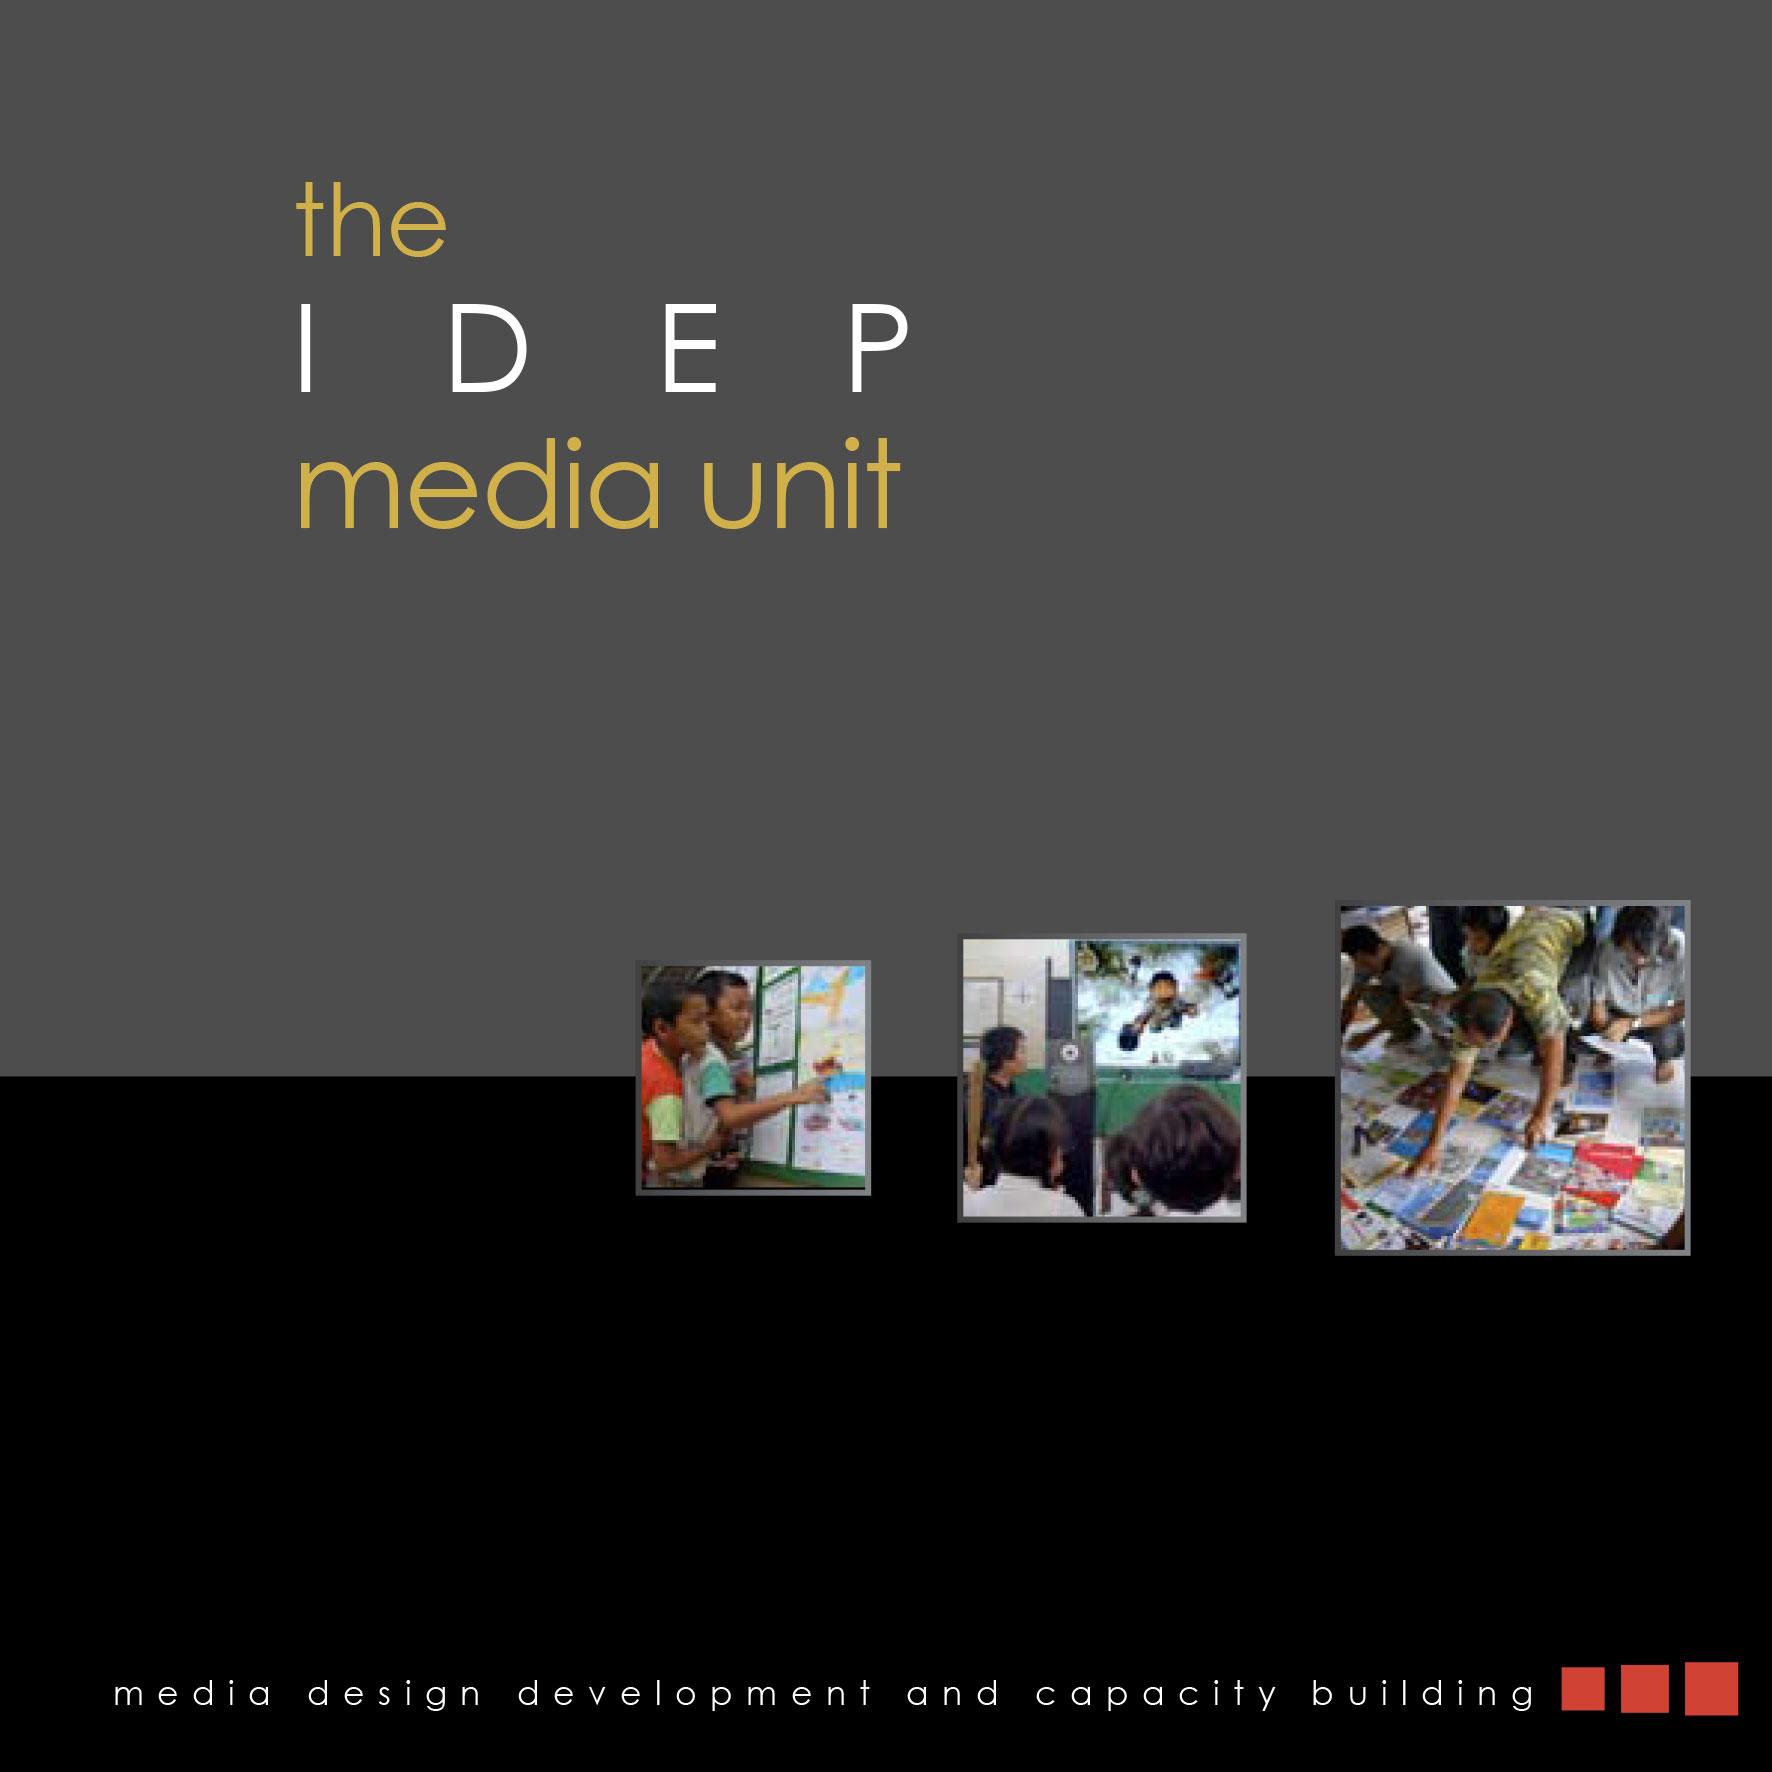 IDEP_MediaUnit-brochure-1.jpg